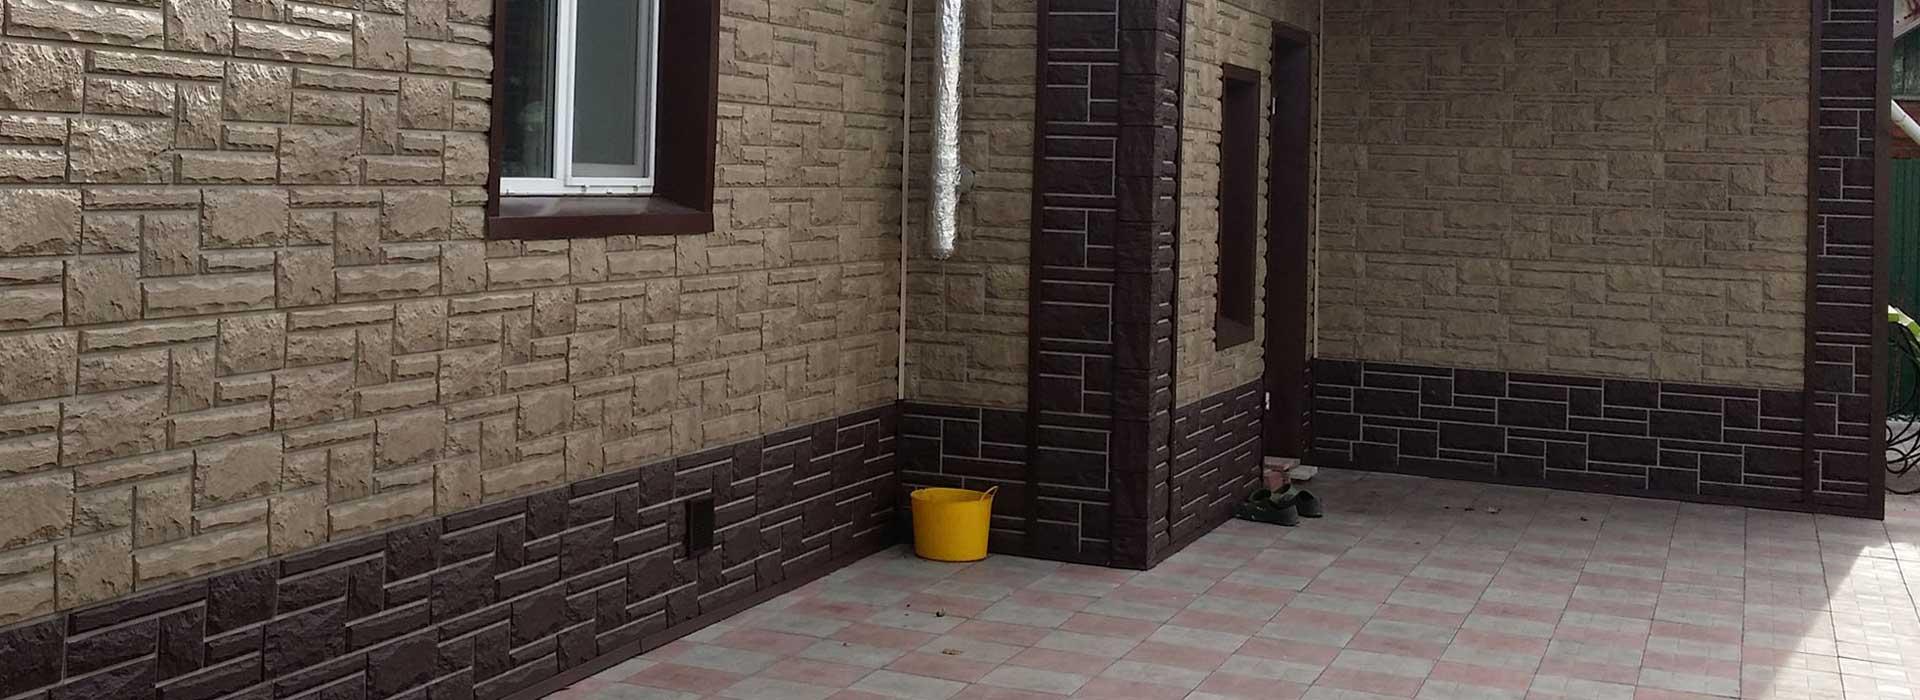 облицовка цоколя дома панелями под камень